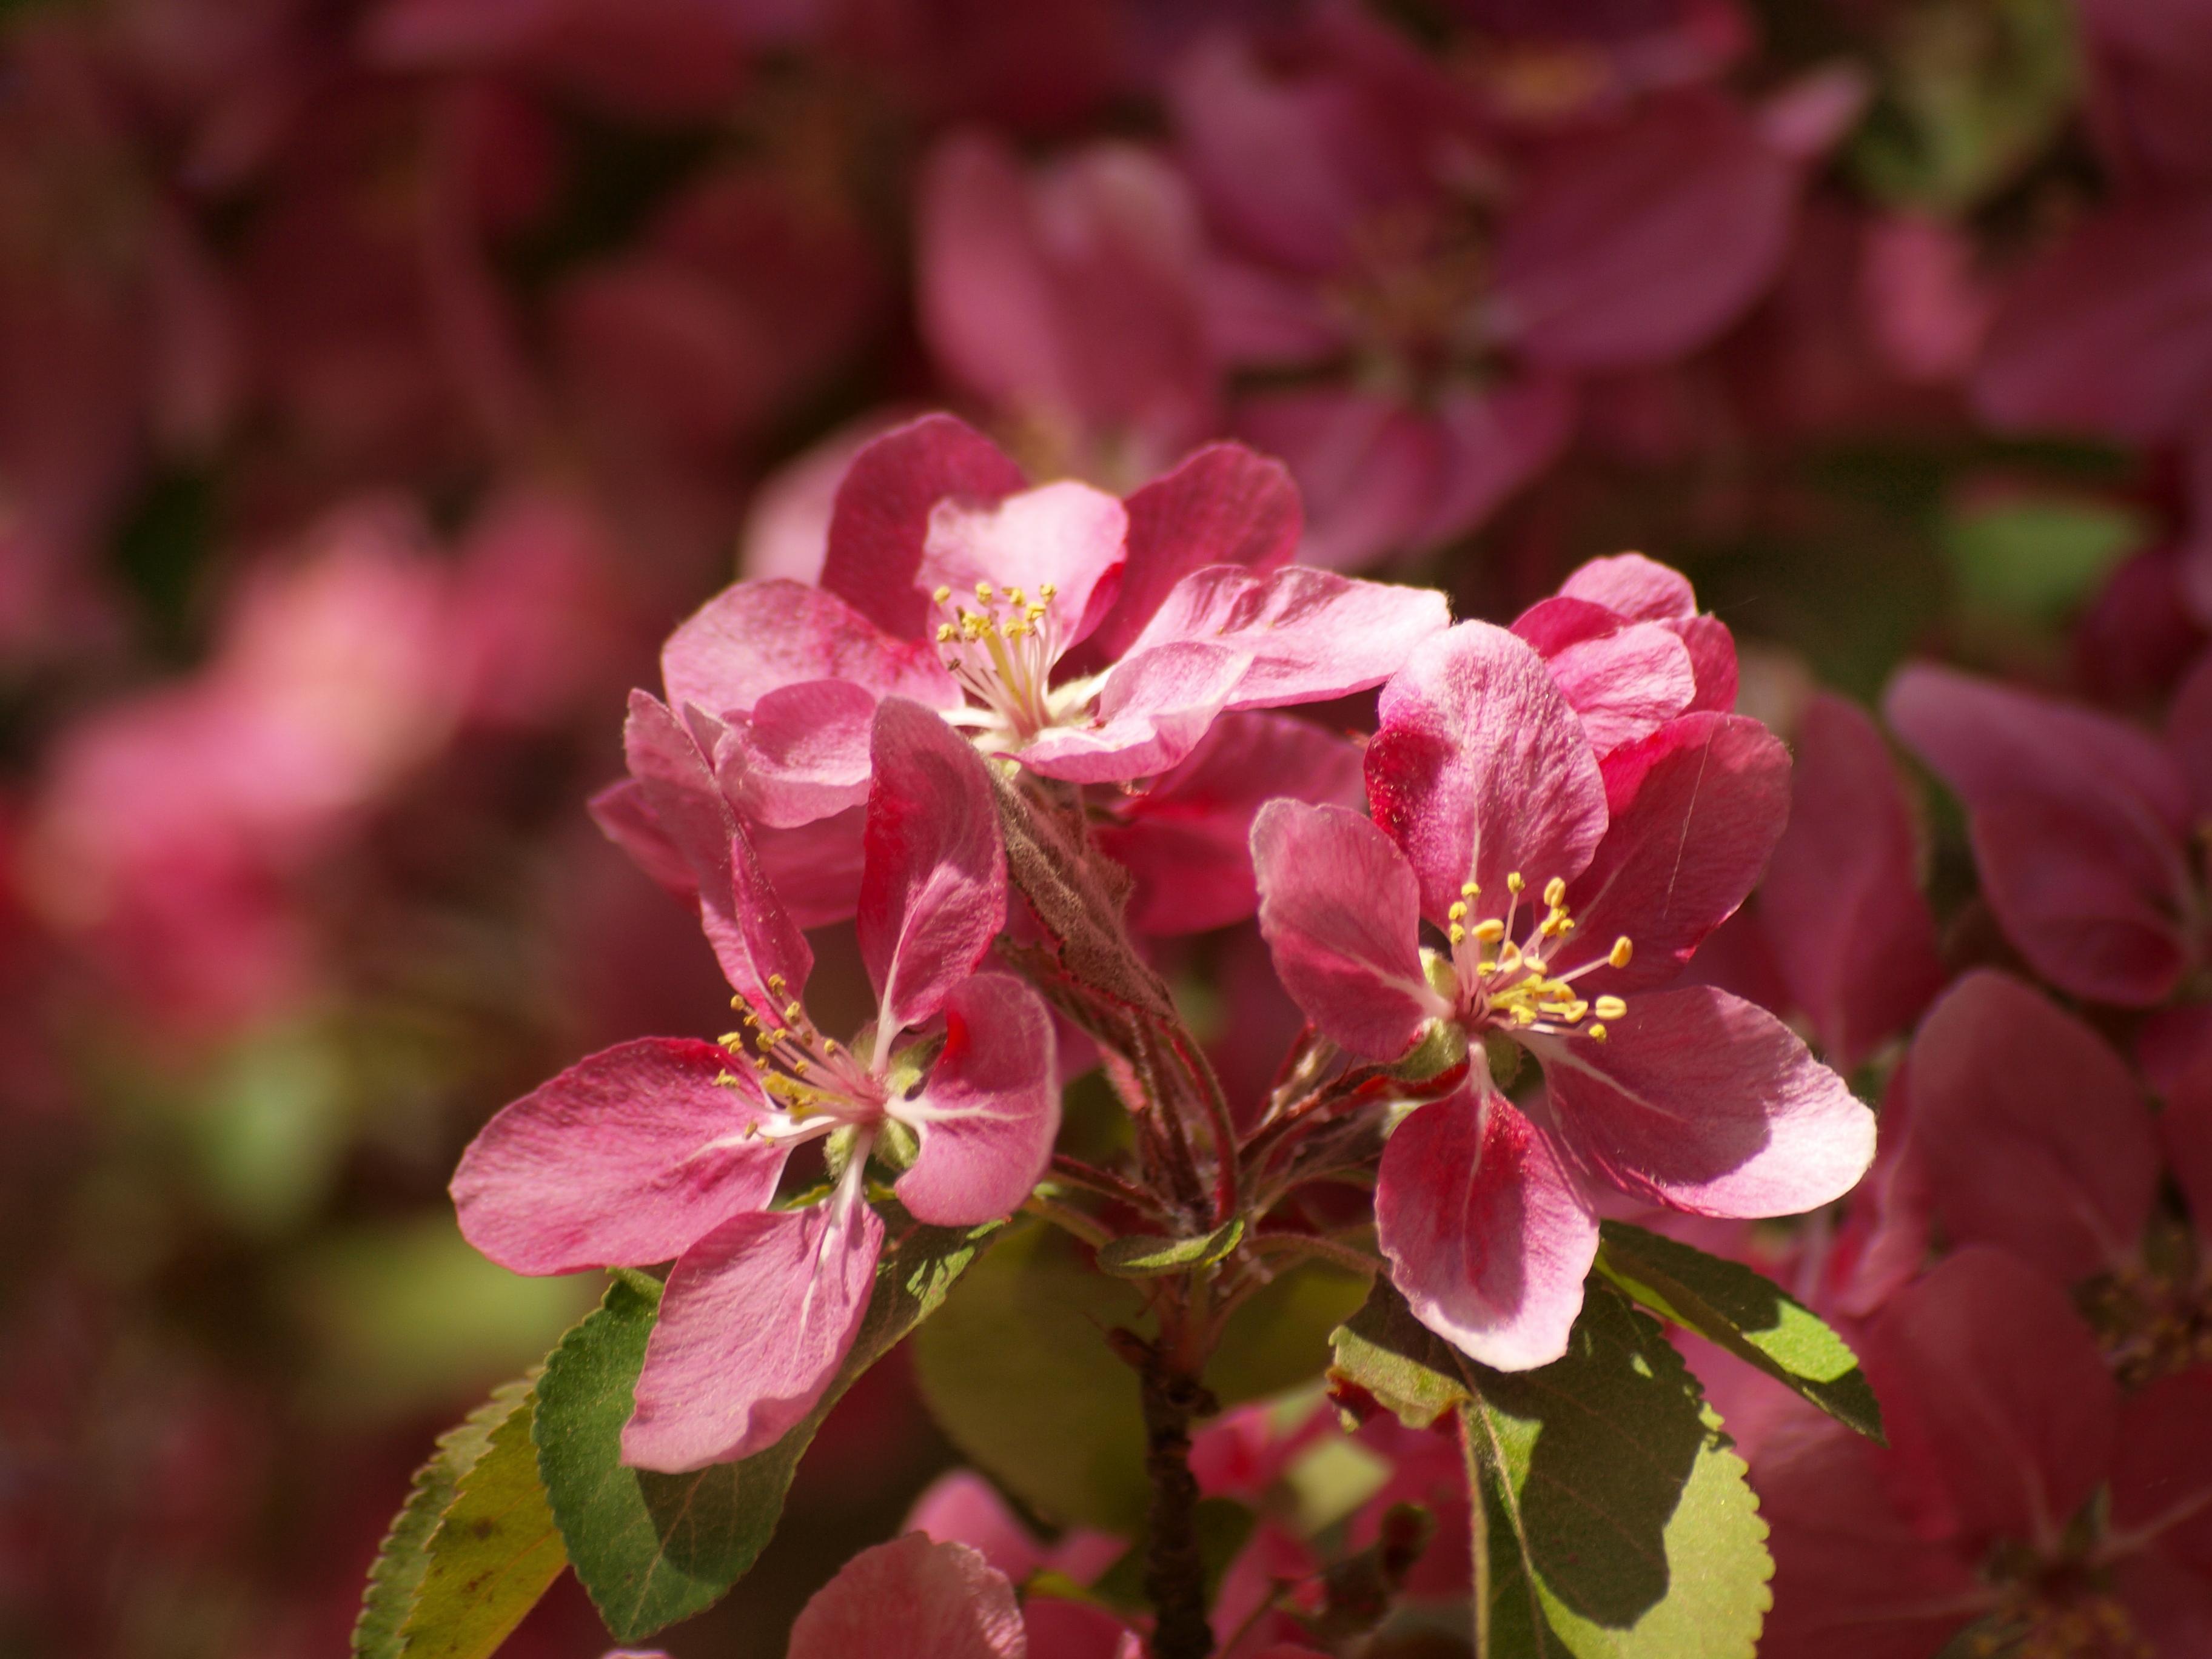 Cherry tree flowers, summer, sunny, tree, red, HQ Photo